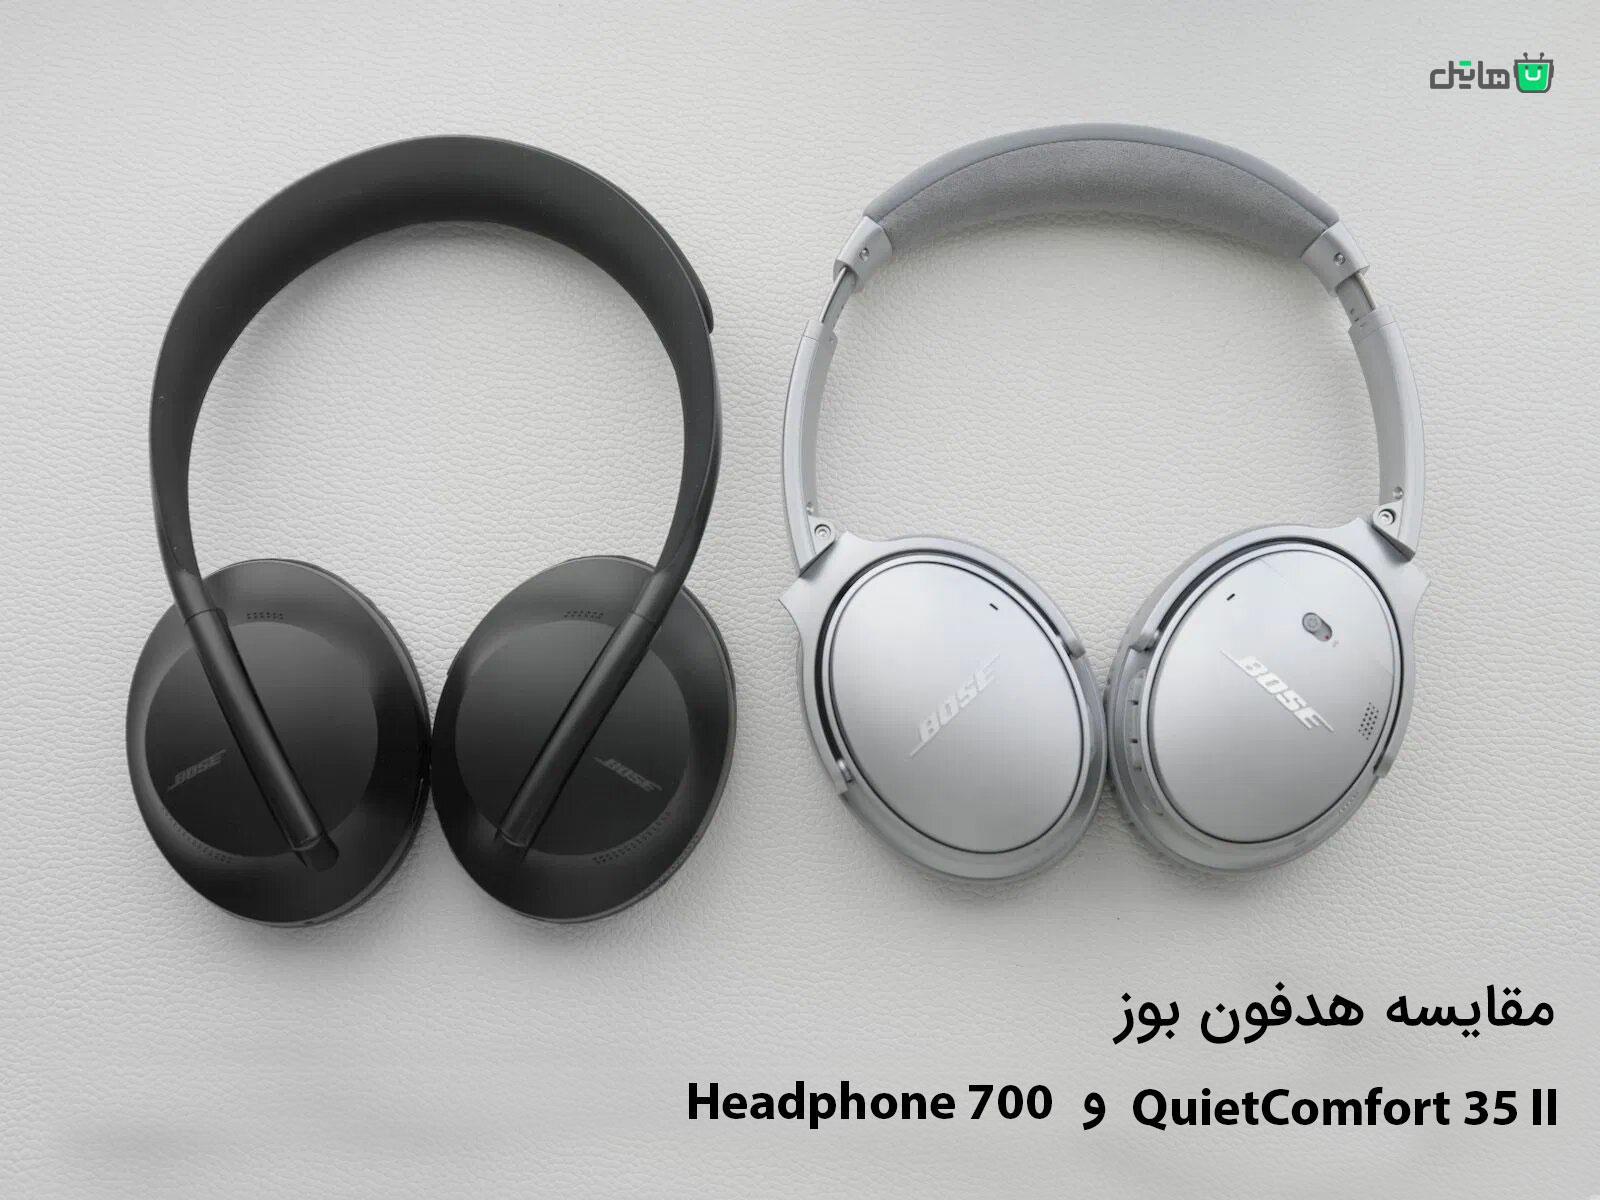 bose-quietcomfort-35-ii-vs-bose-700